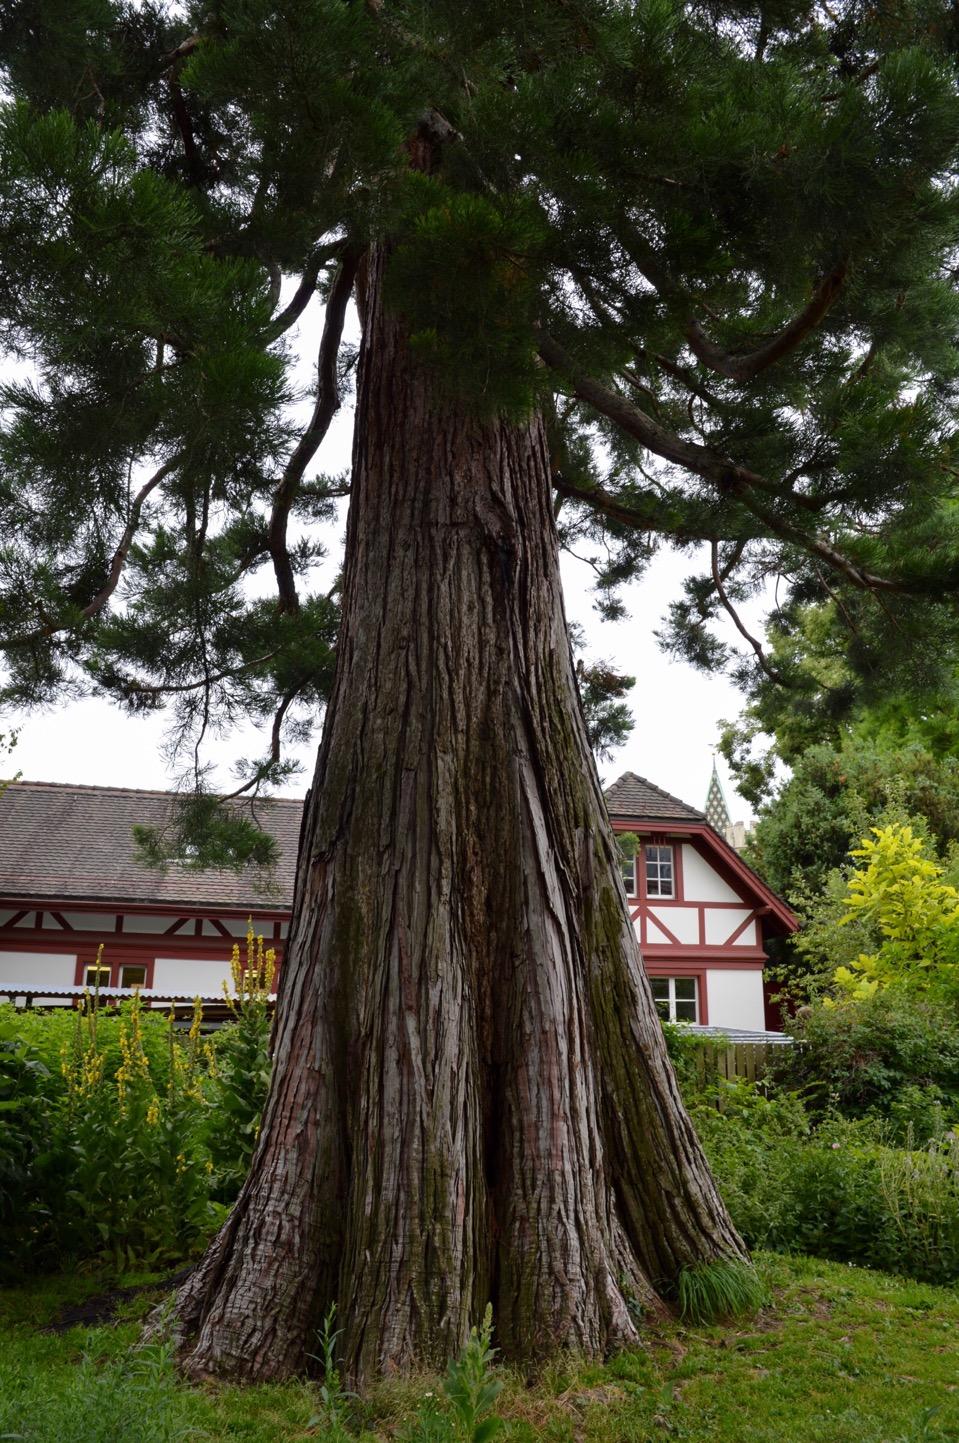 Tree, Universität Basel Botanical Garden, Switzerland